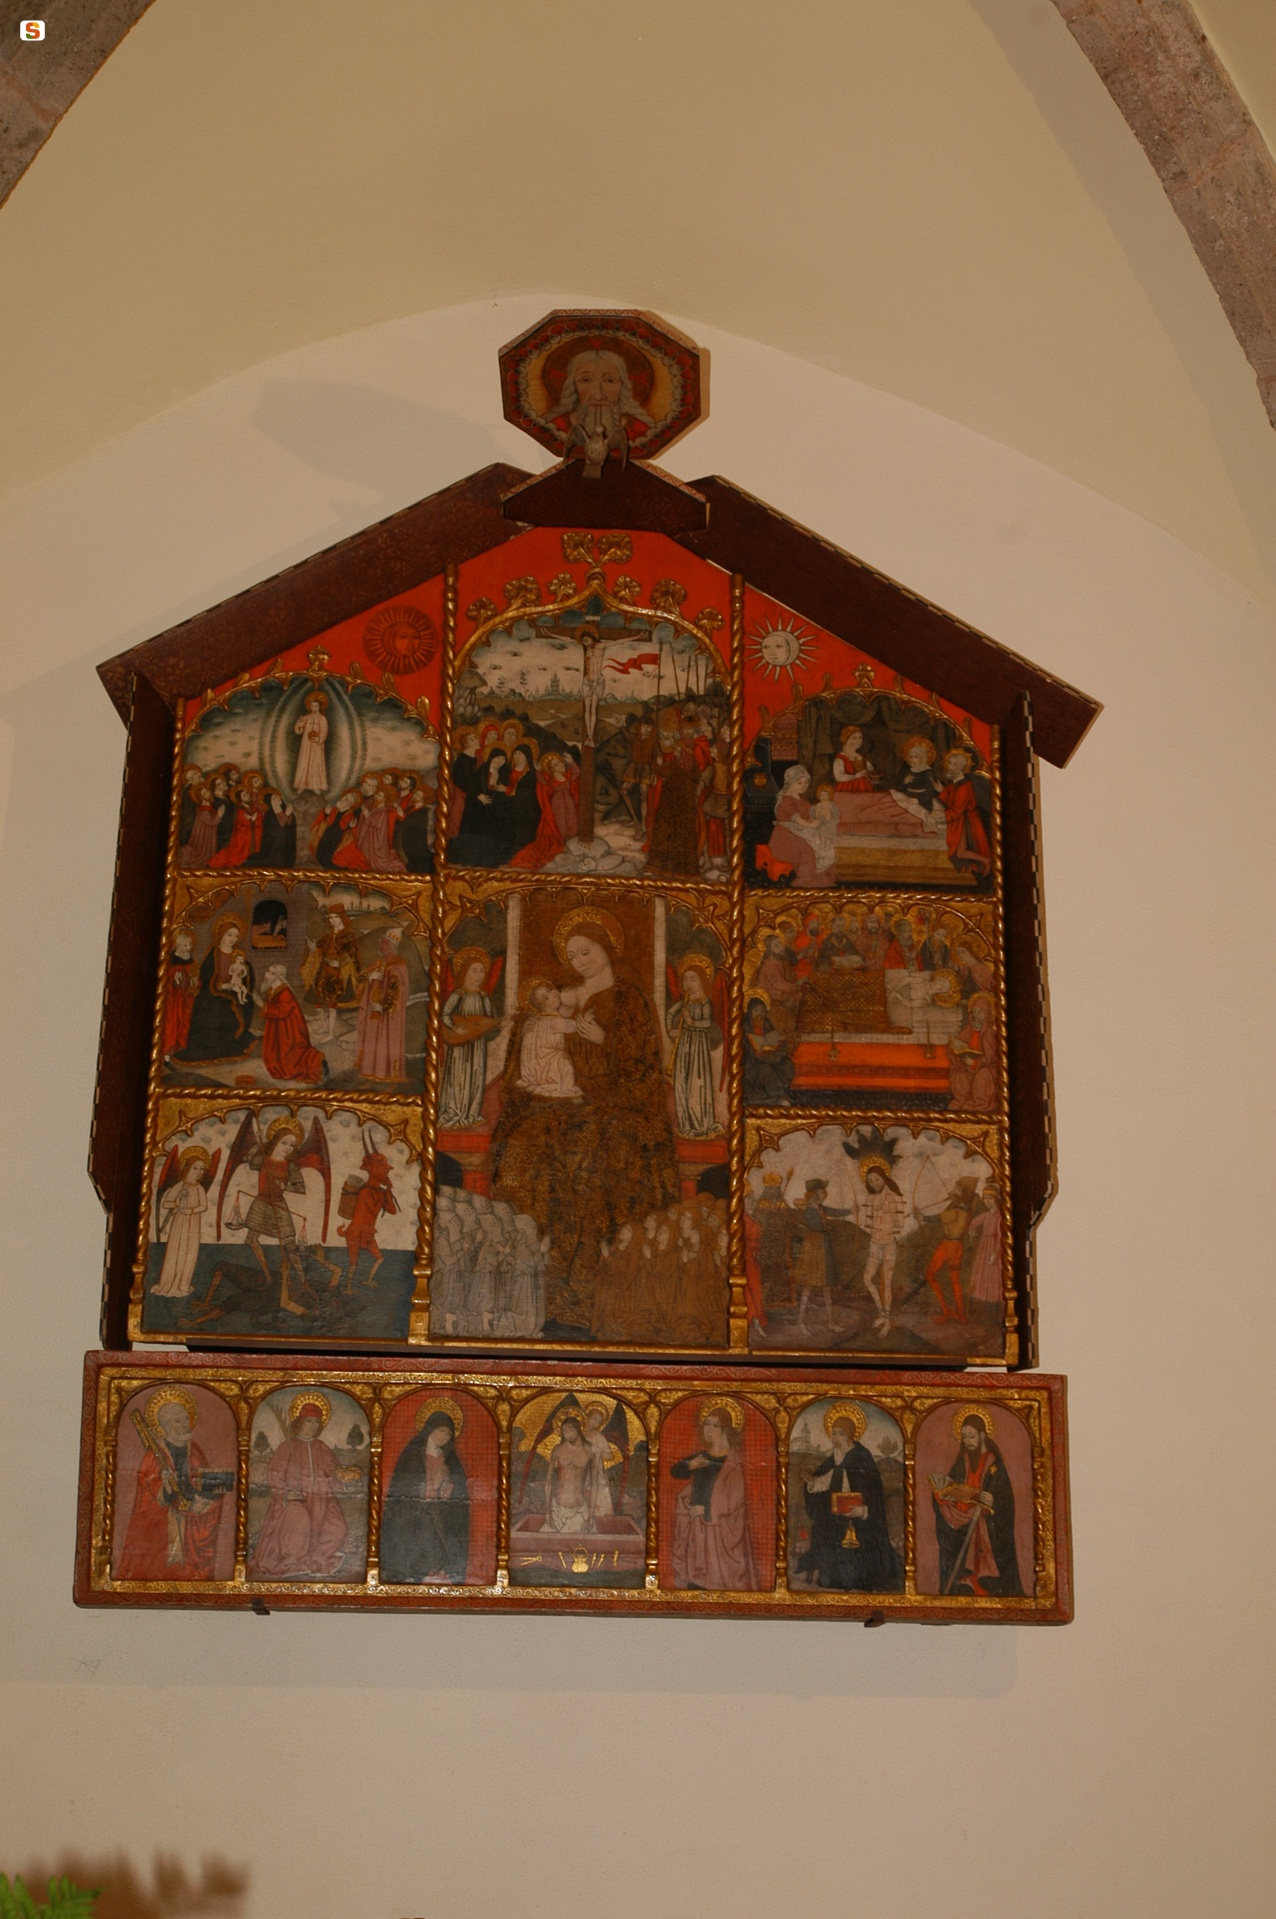 Olzai, Retablo della Pestilenza, chiesa Santa Barbara - Fonte www.sardegnaturismo.it